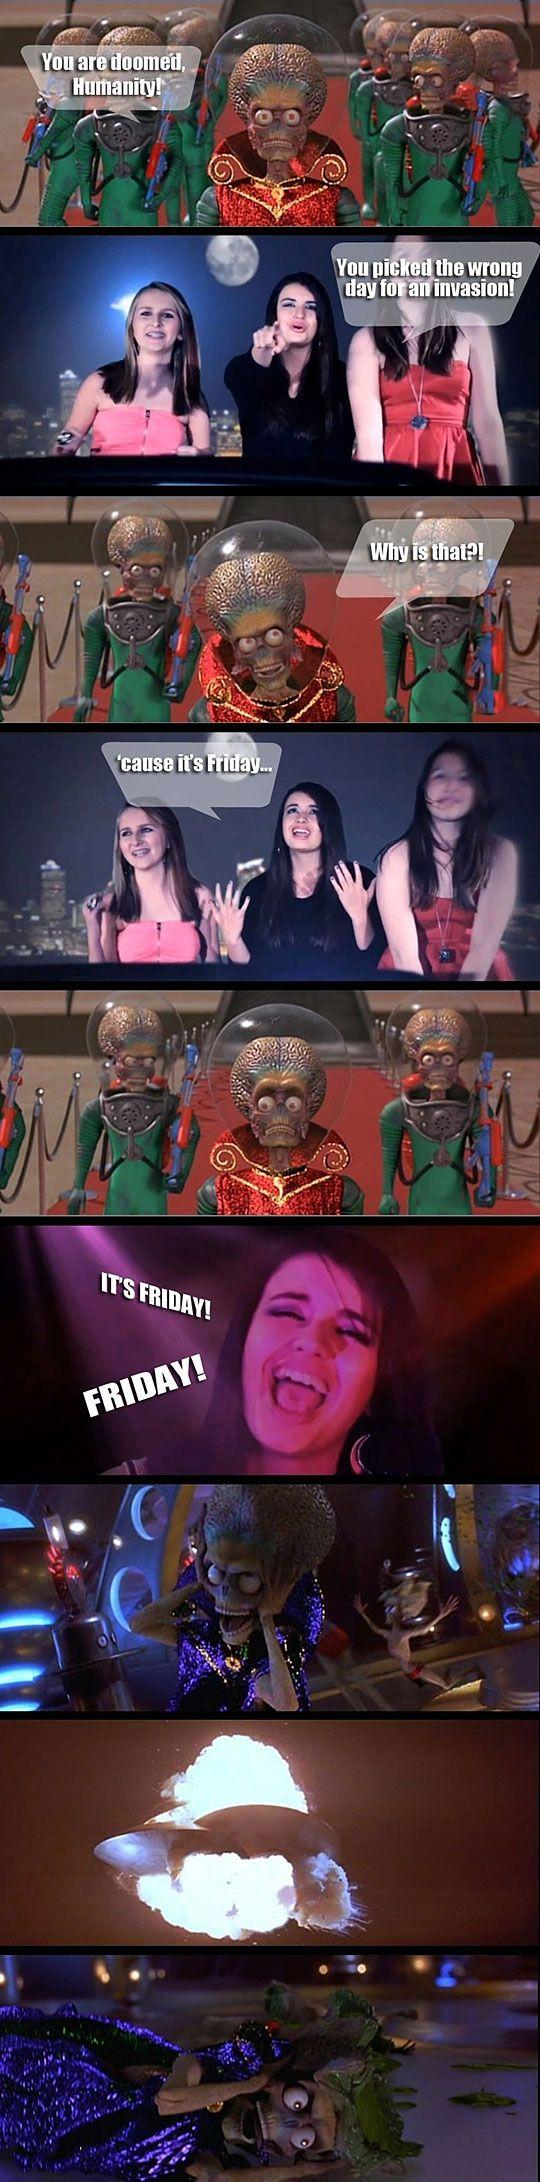 Rebecca Black vs Mars Attacks